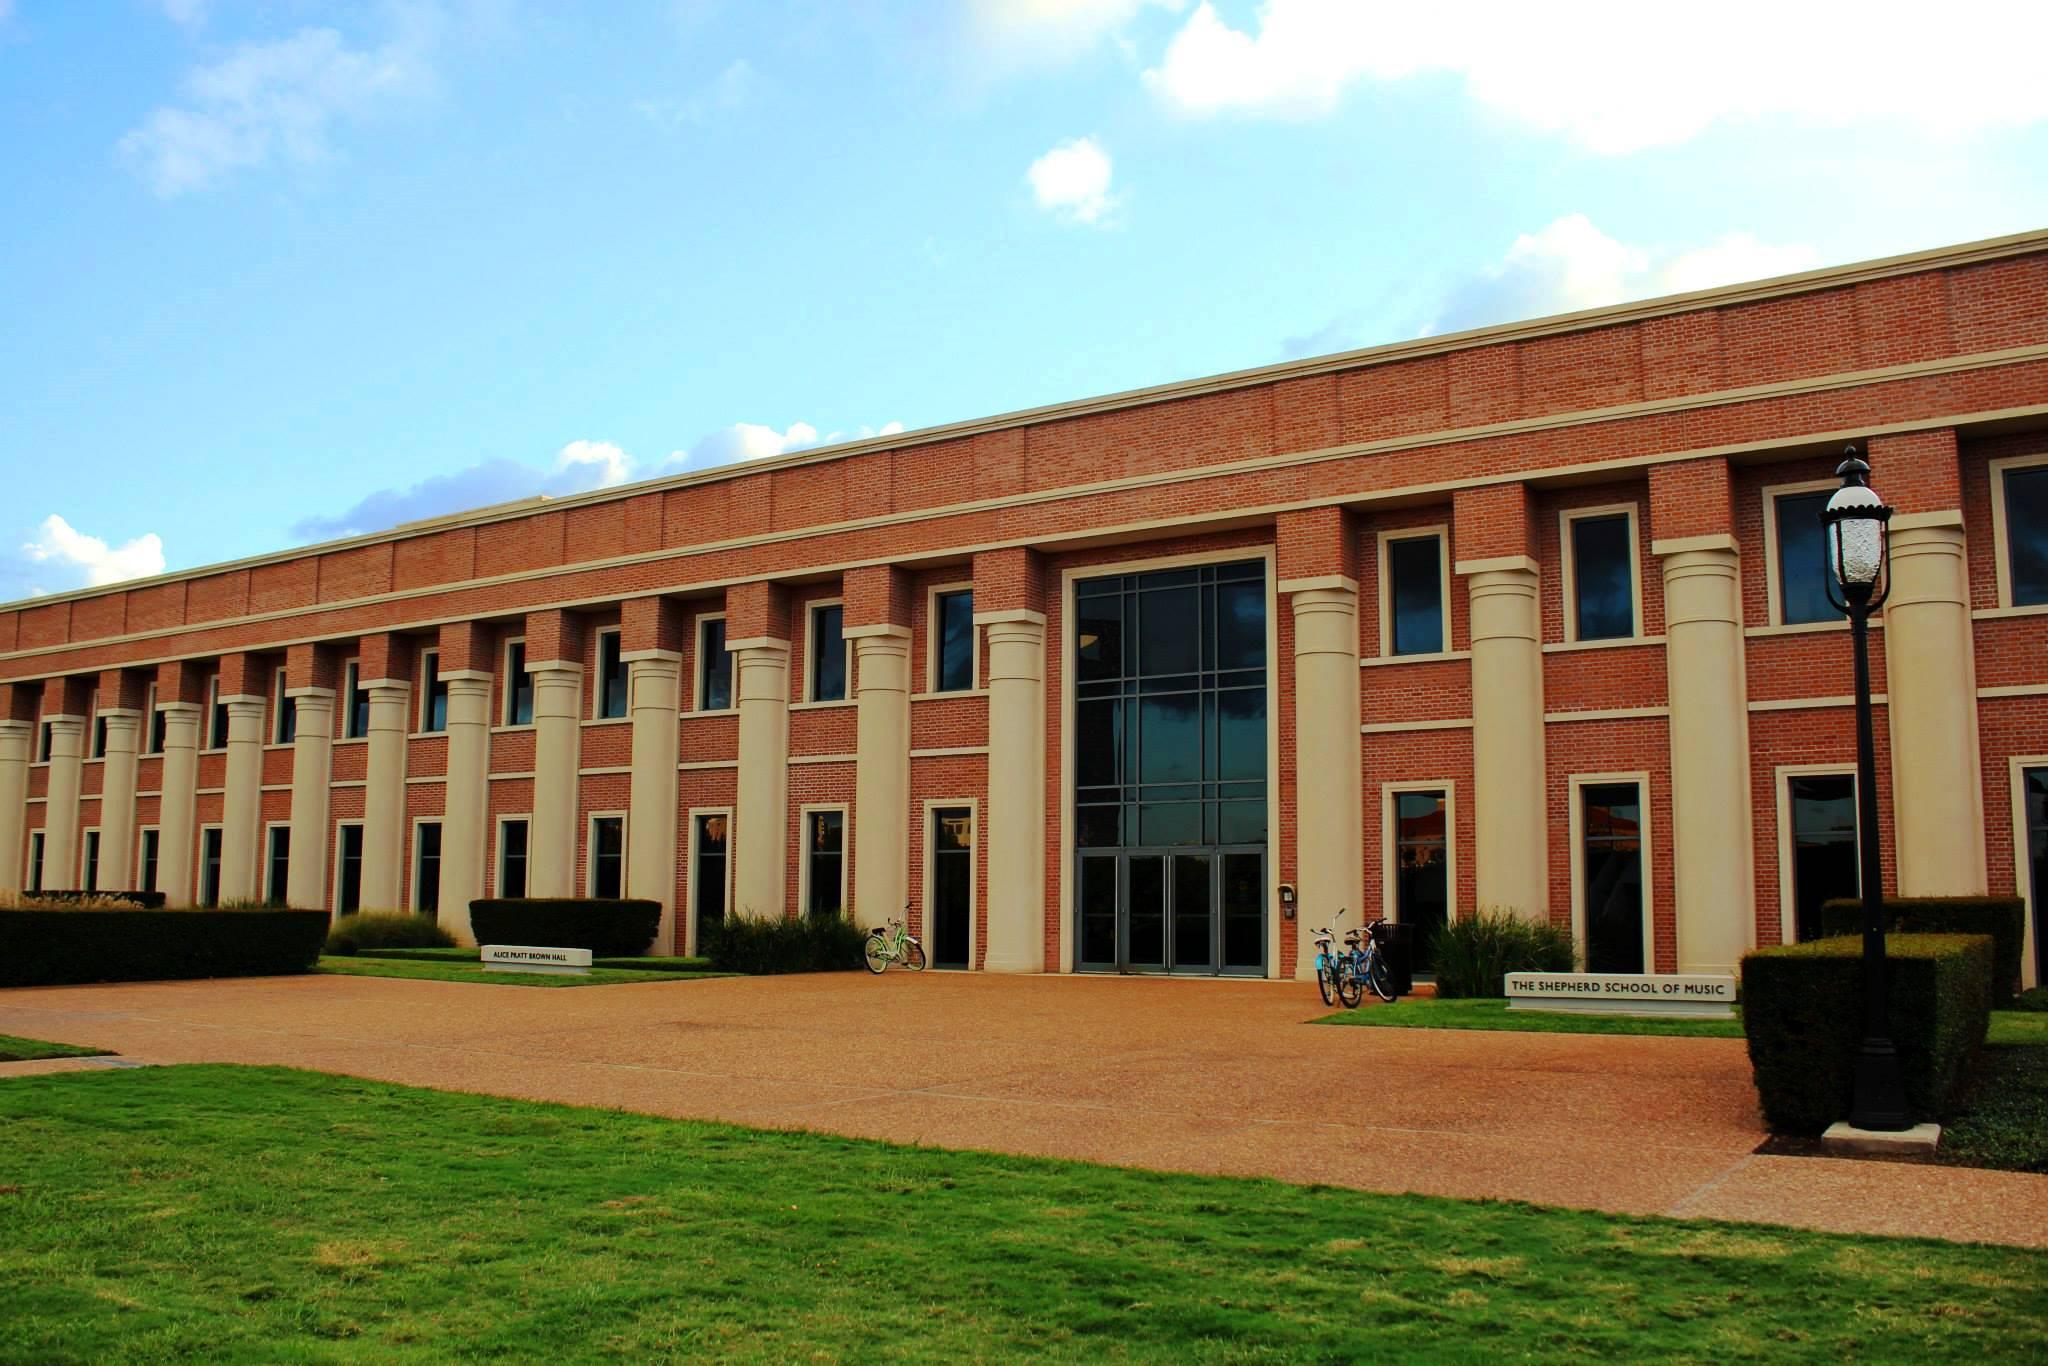 The Shepherd School of Music at Rice University